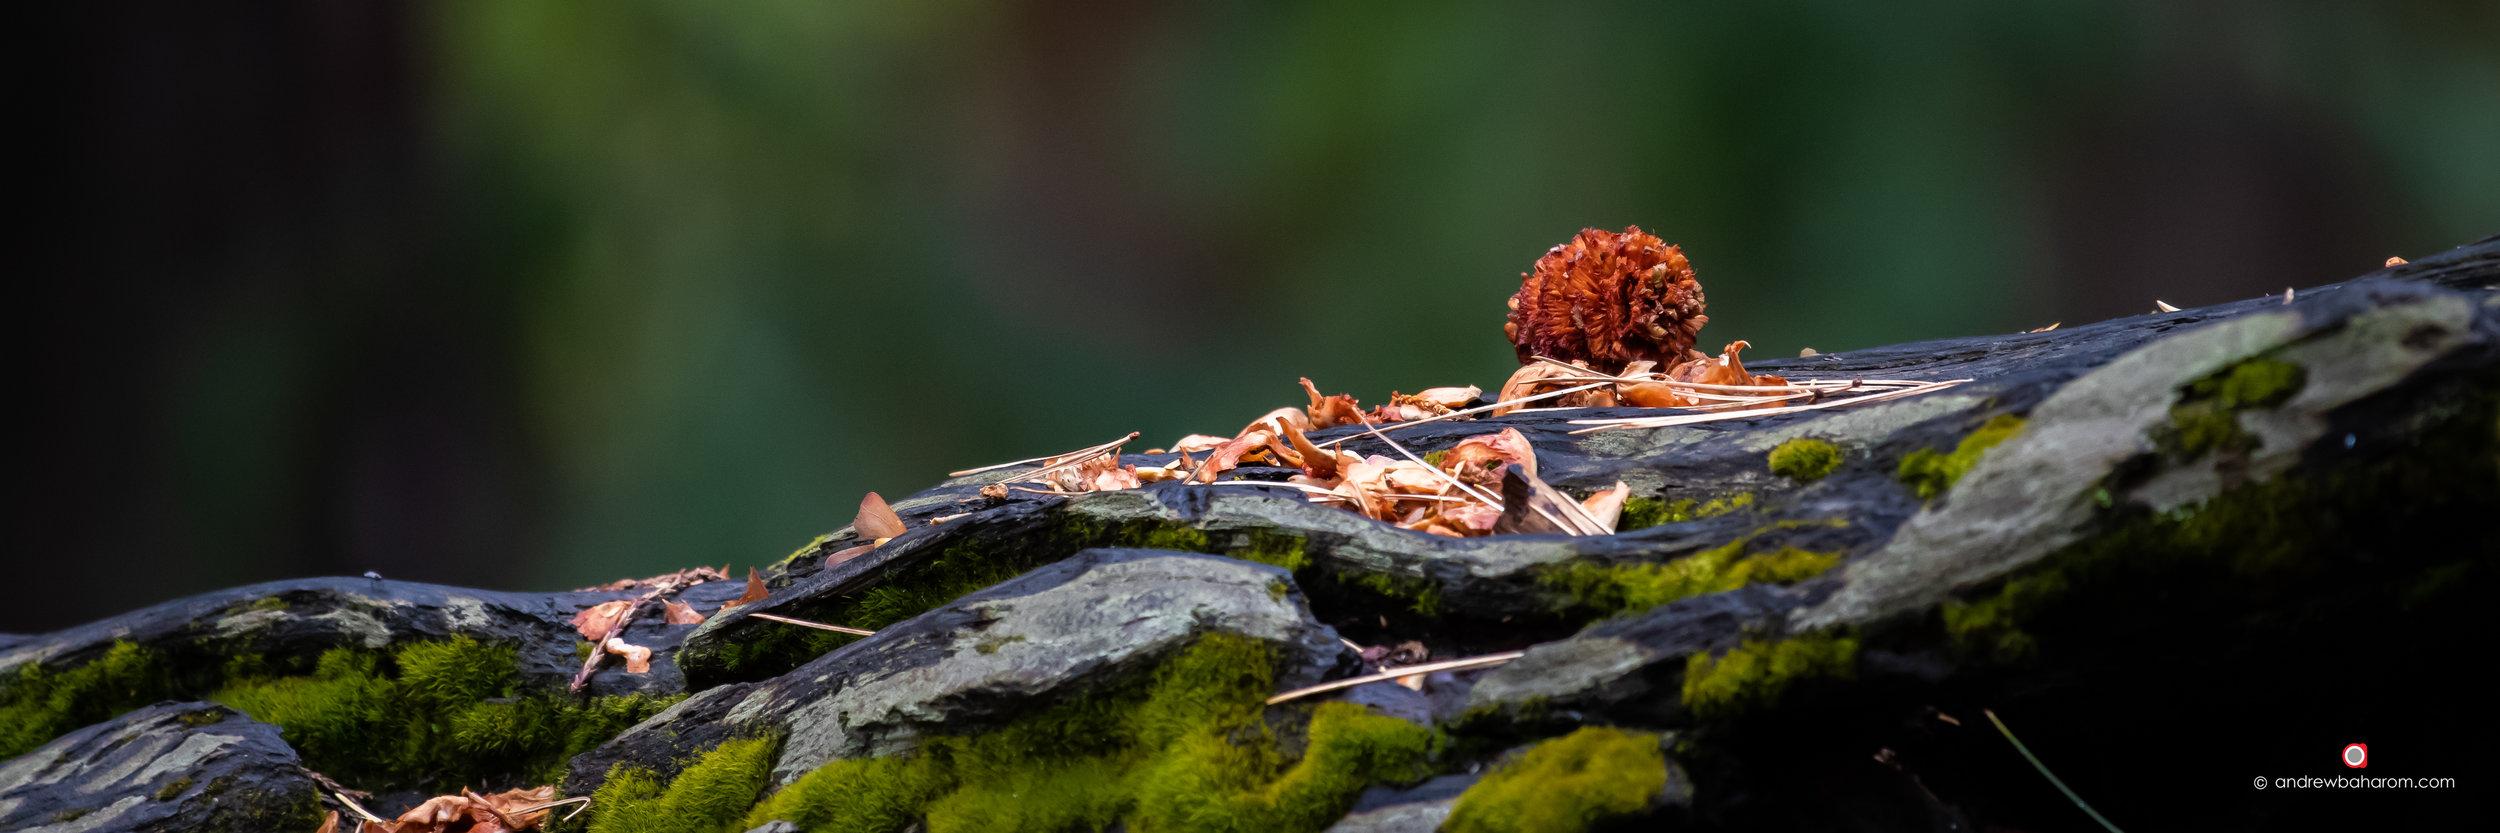 Weathered Pine Cone.jpg